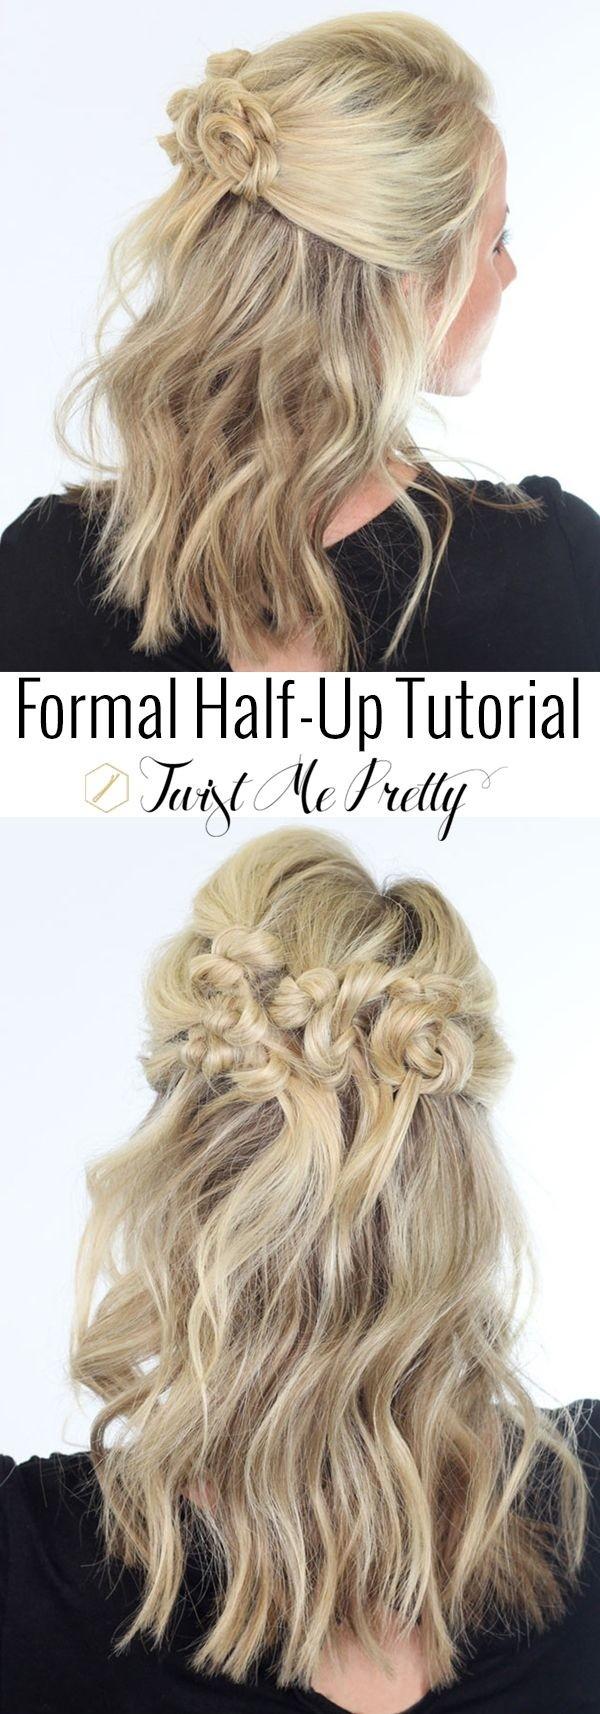 Twisted-Bun-Half-Updo-for-Mid-Length-Hair Great Hairstyles for Medium Length Hair 2019